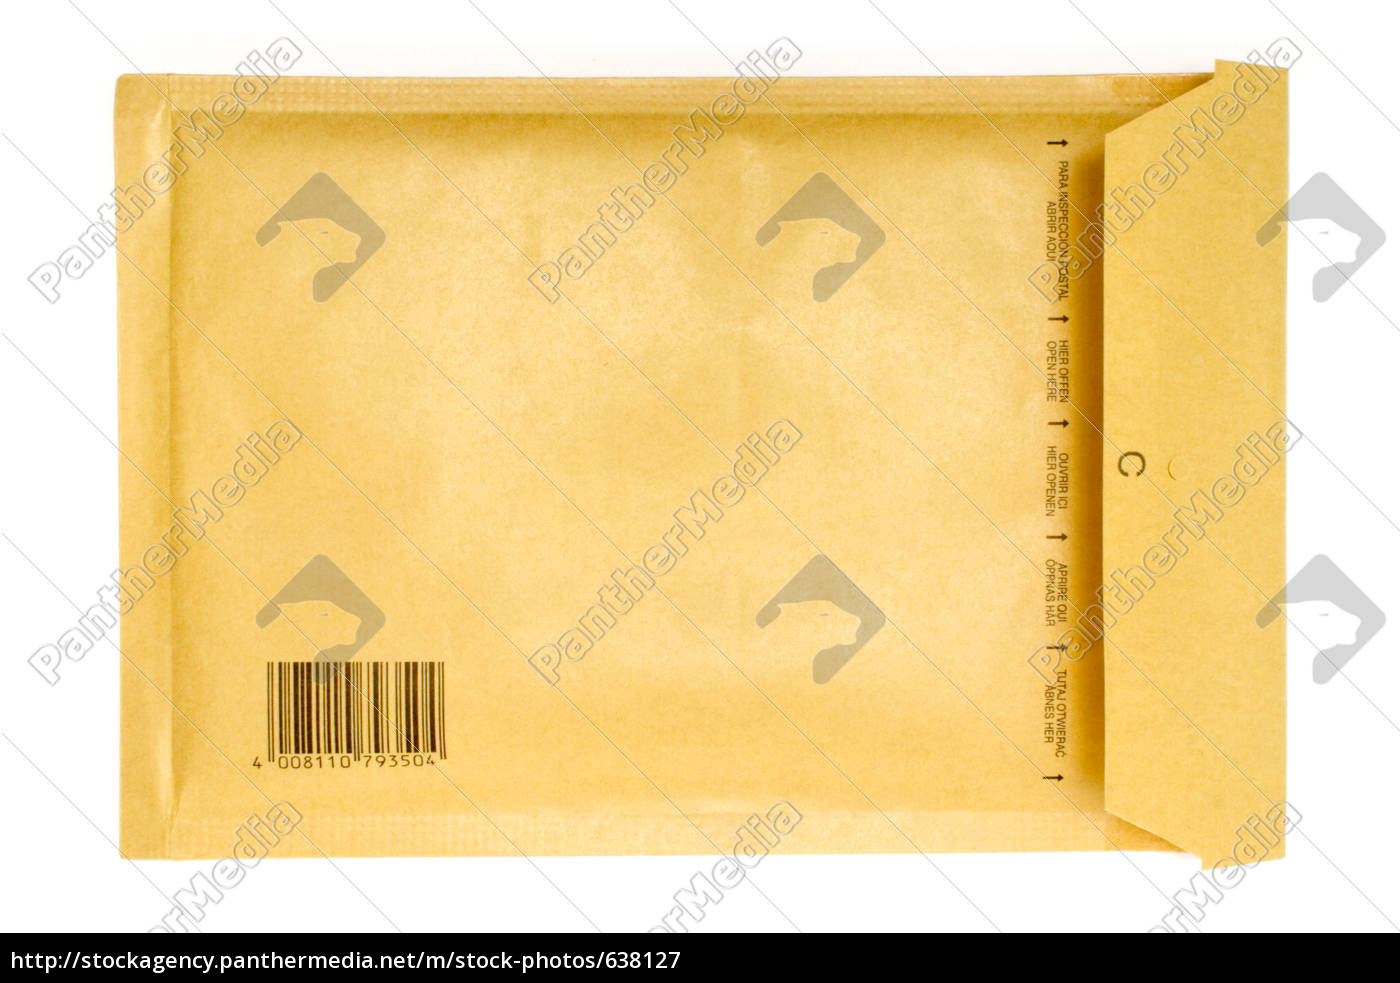 brown, envelope - 638127